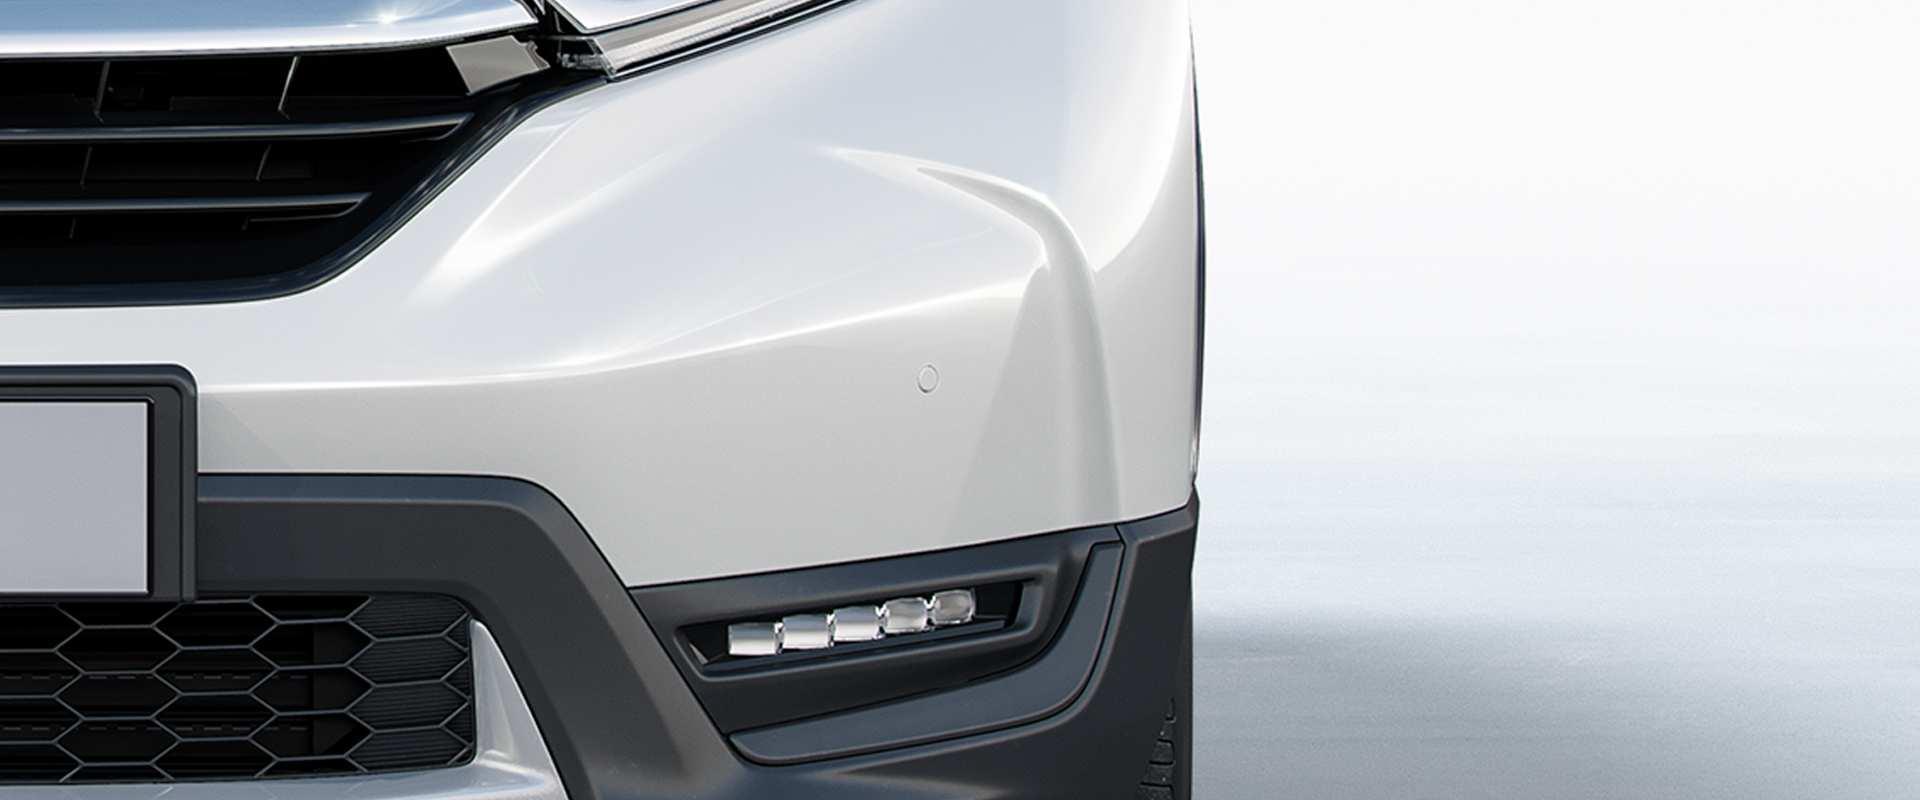 Sensores de estacionamento dianteiro e traseiro